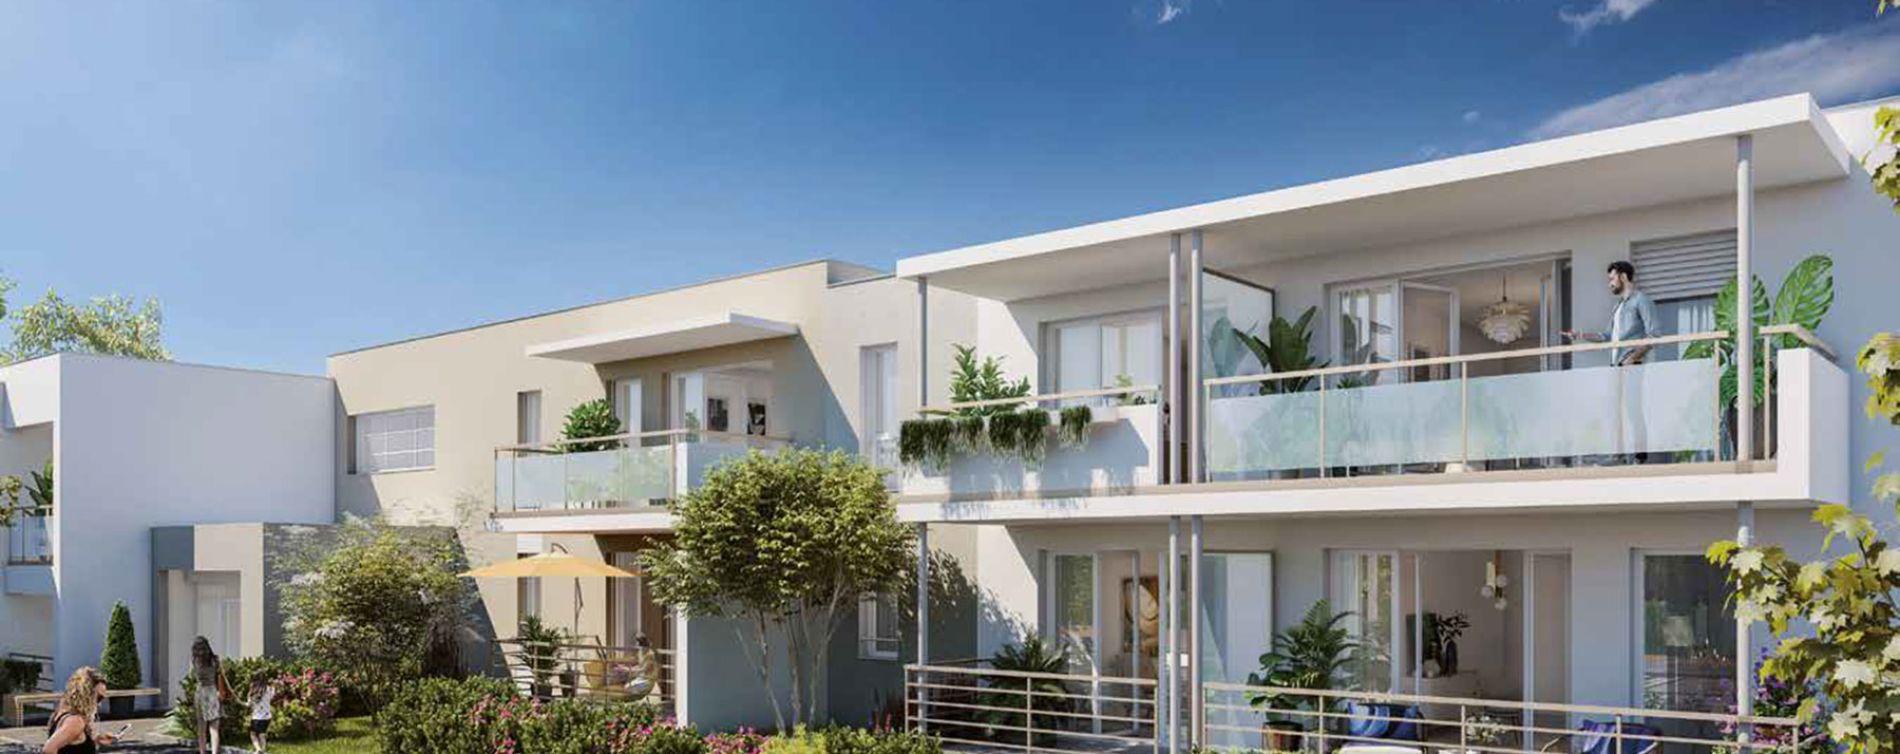 Les Angles : programme immobilier neuve « Ter Natura »